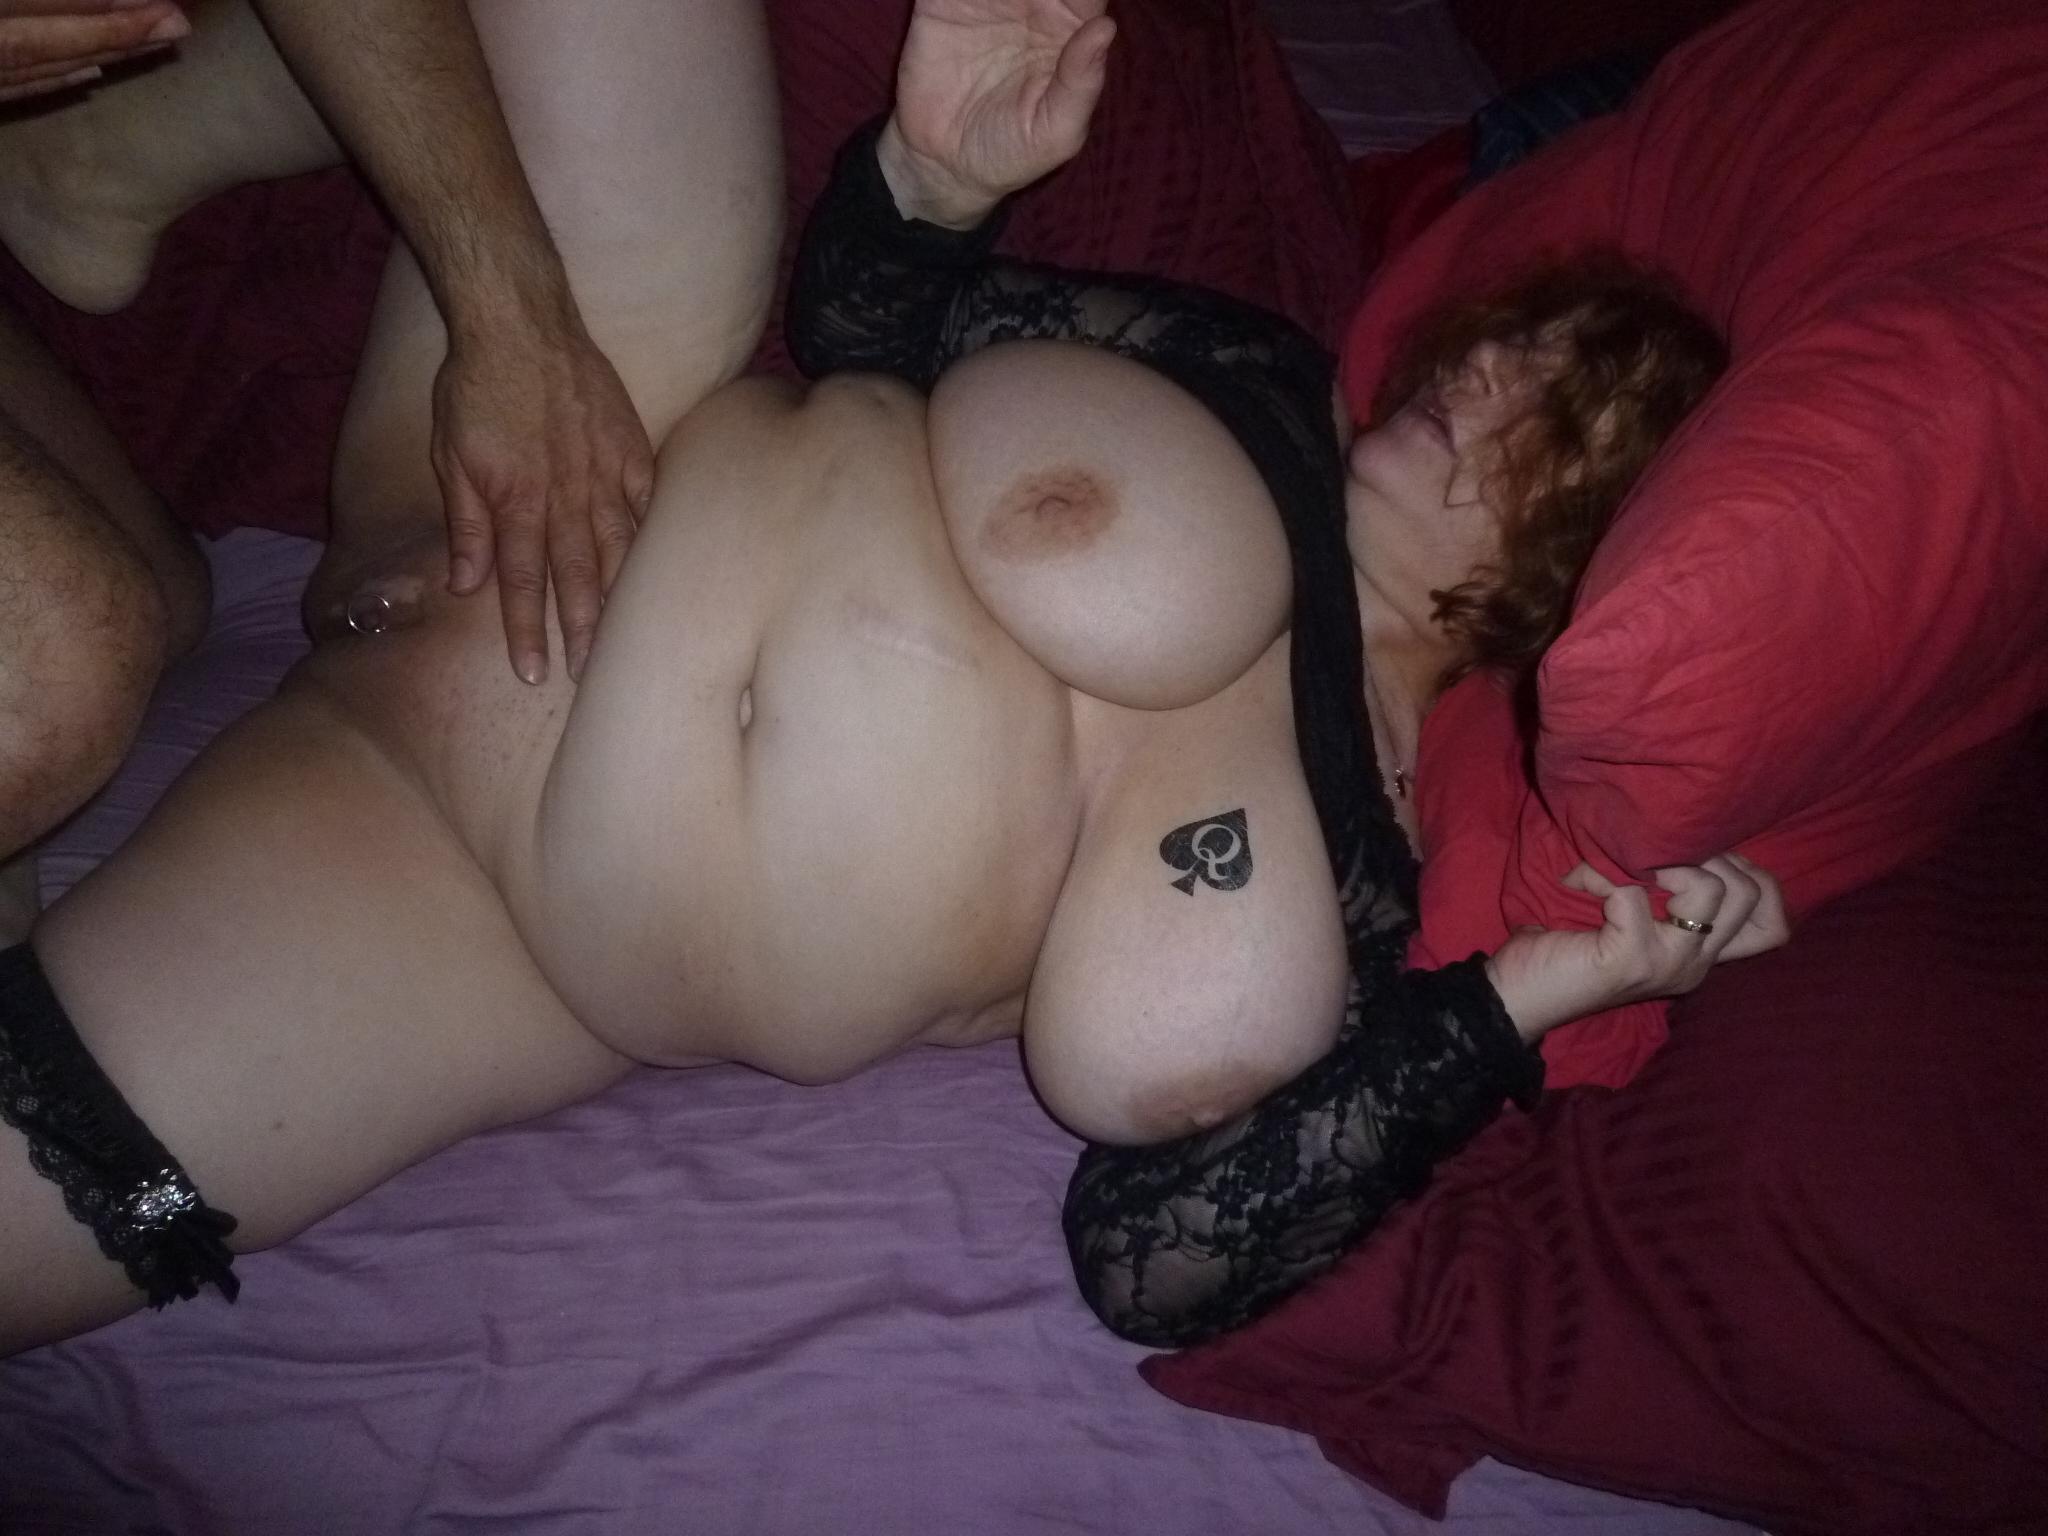 Queen of spades - Asian On Yuvutu Homemade Amateur Porn ...